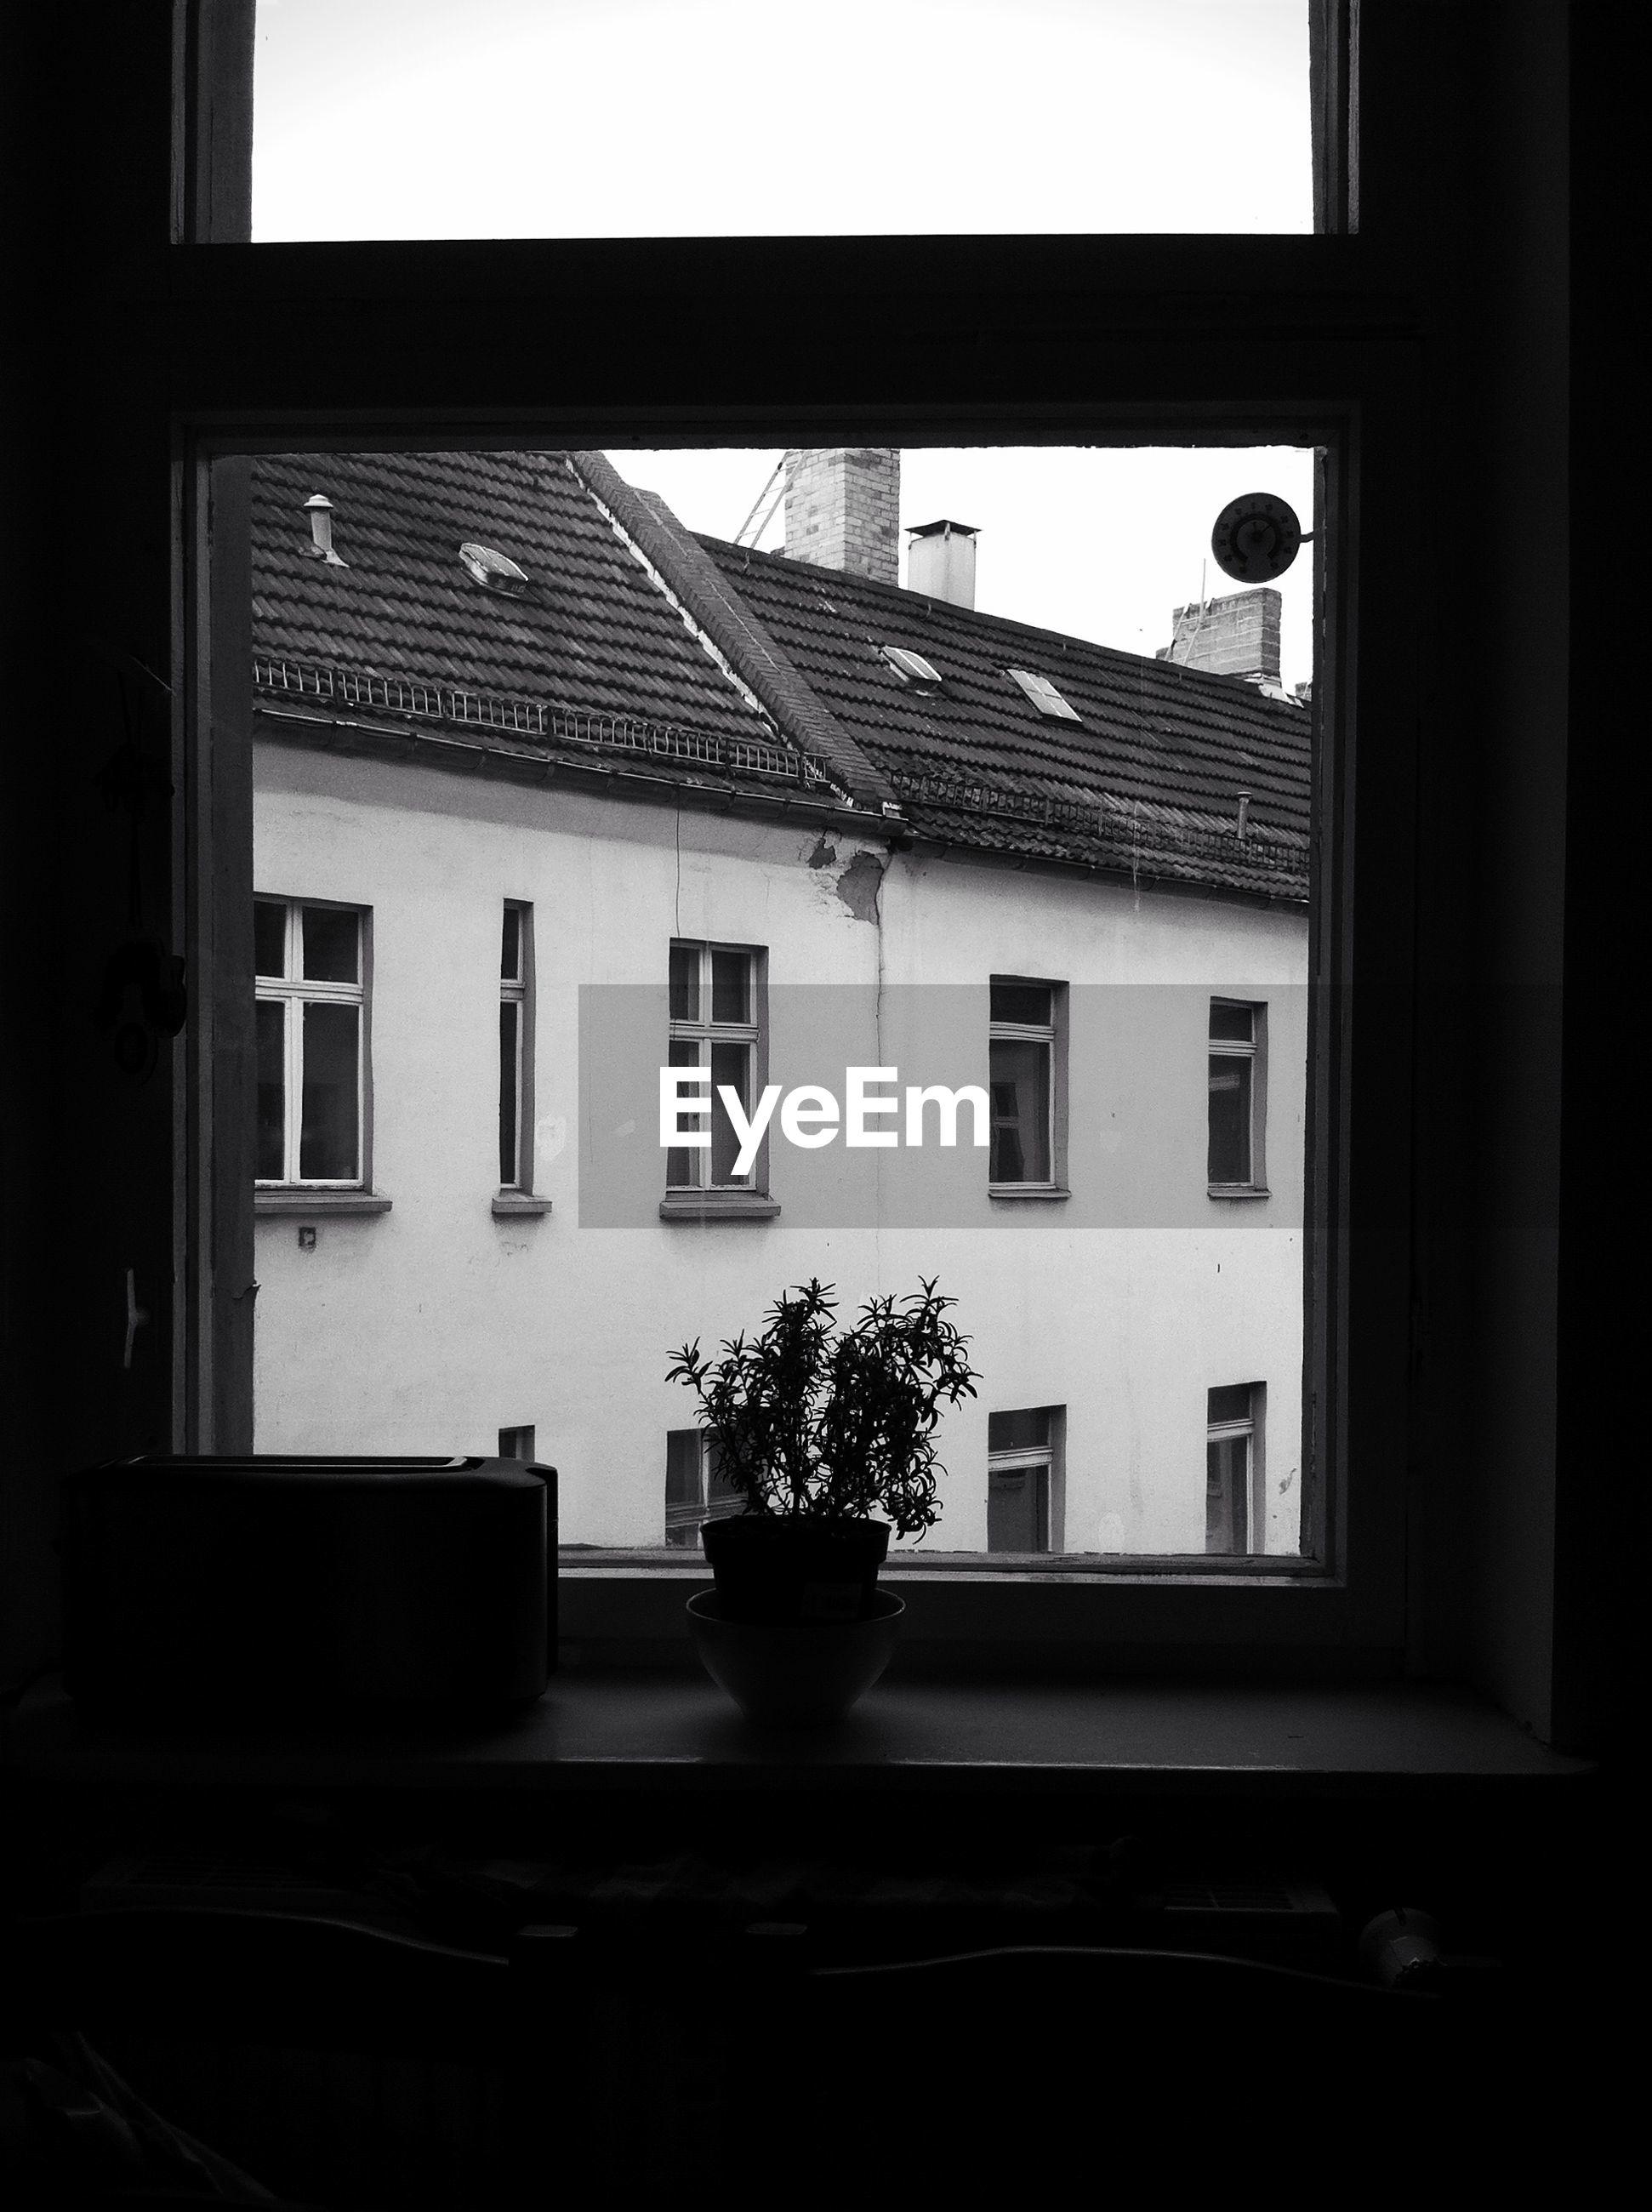 House seen through window